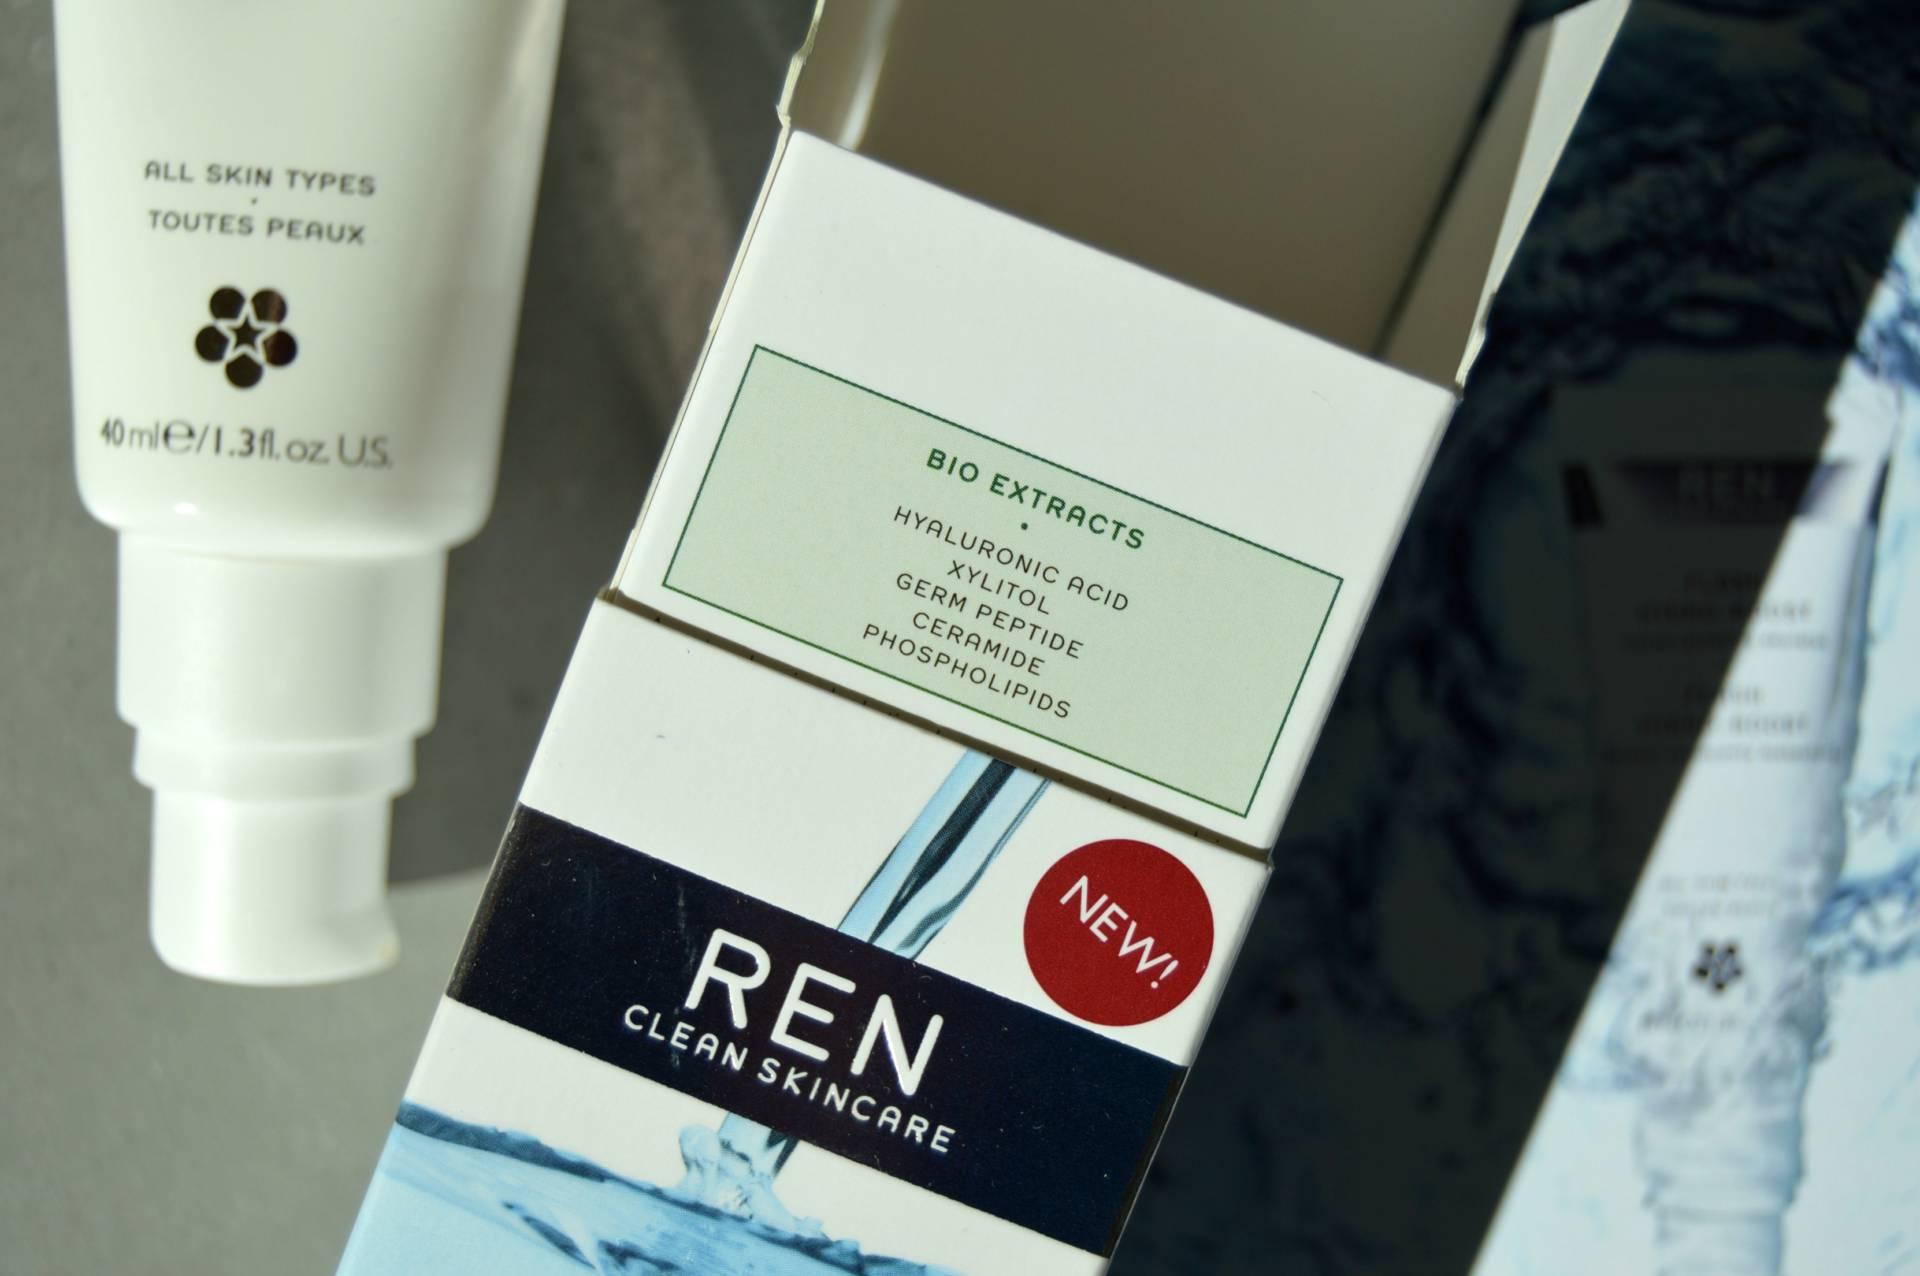 ren new flash hydro boost lotion inhautepursuit review